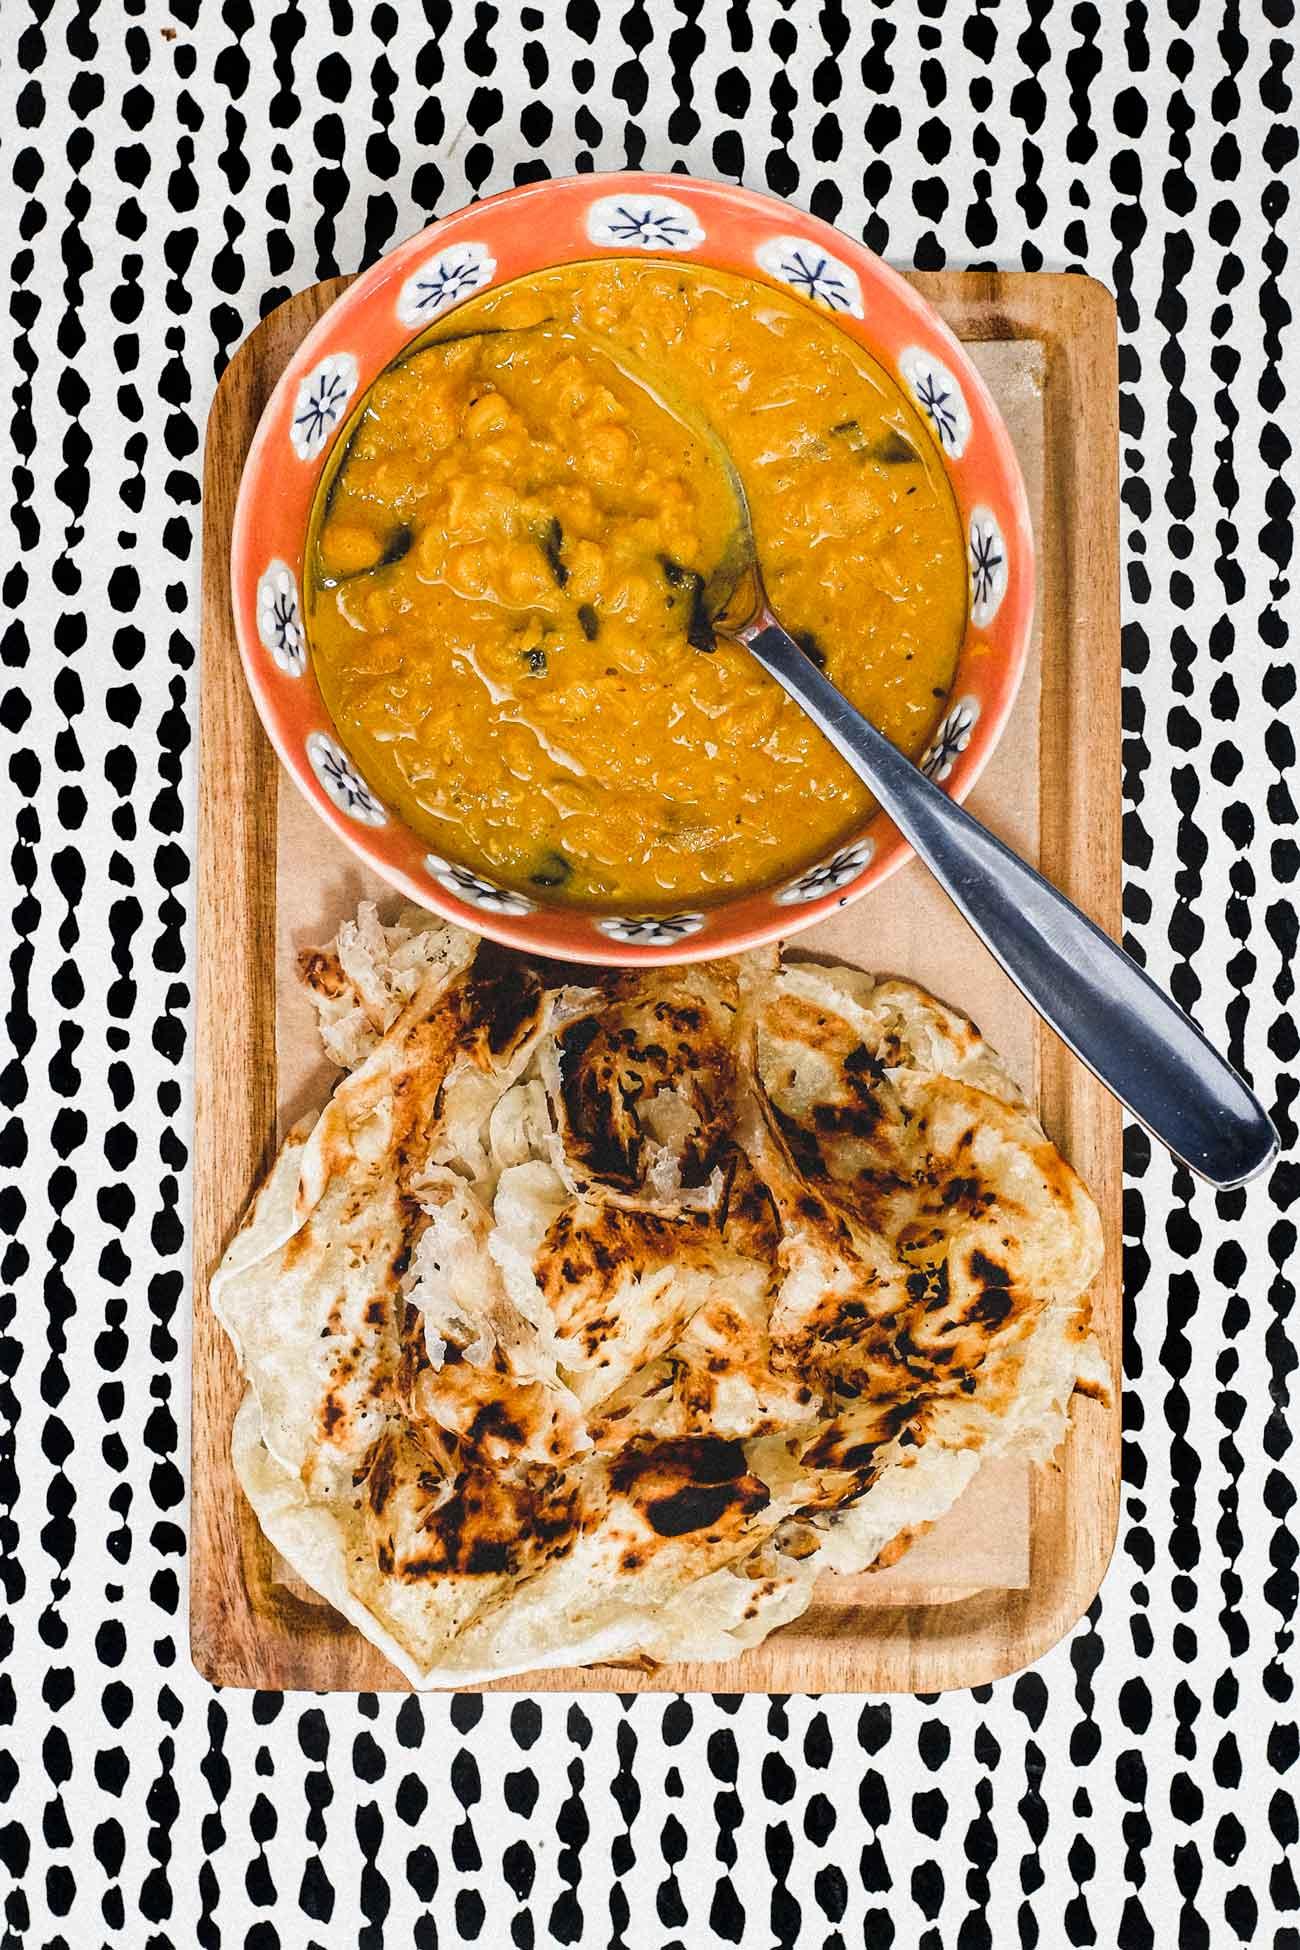 Roti Canai with Dhal